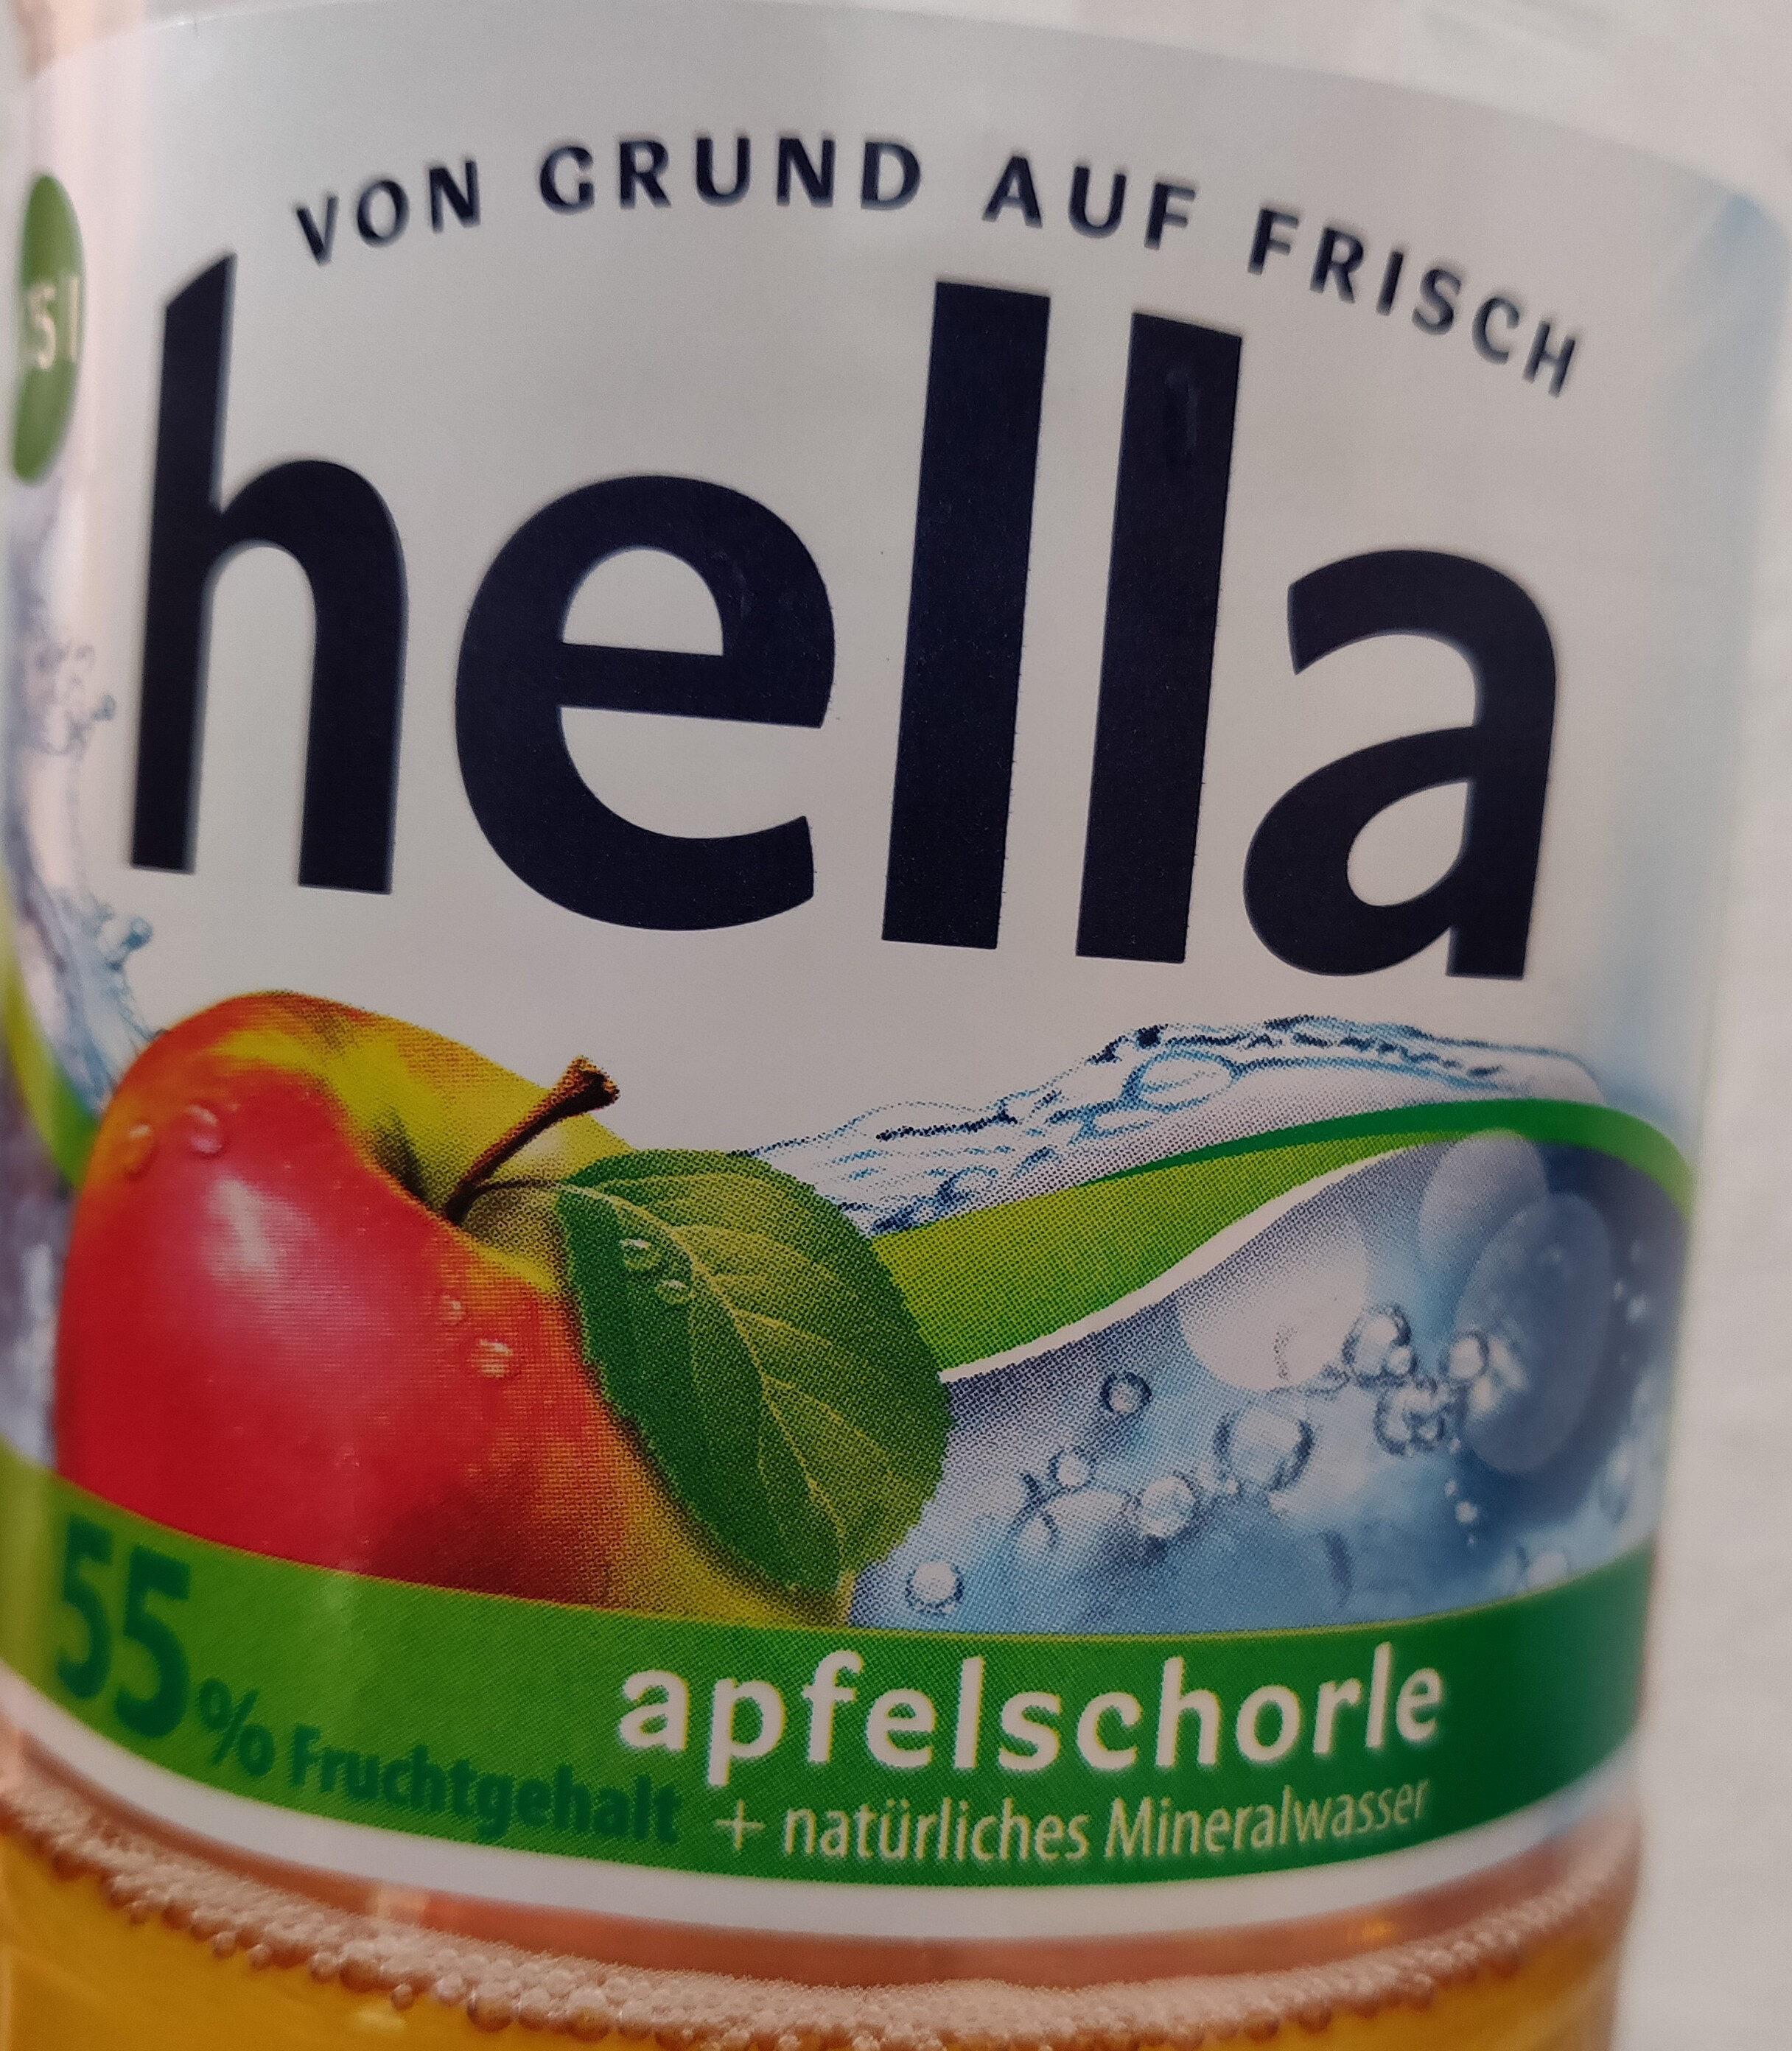 apfelschorle - Product